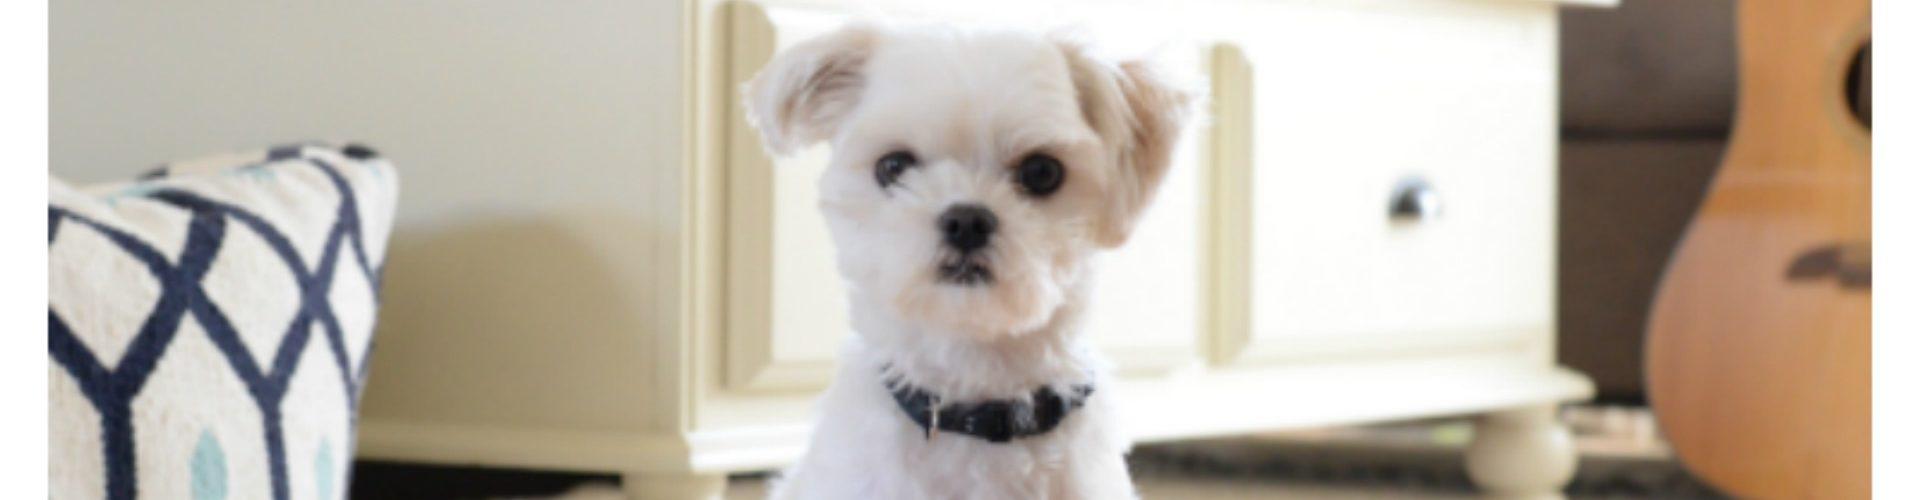 how to organize pet supplies - dog supplies - pet storage